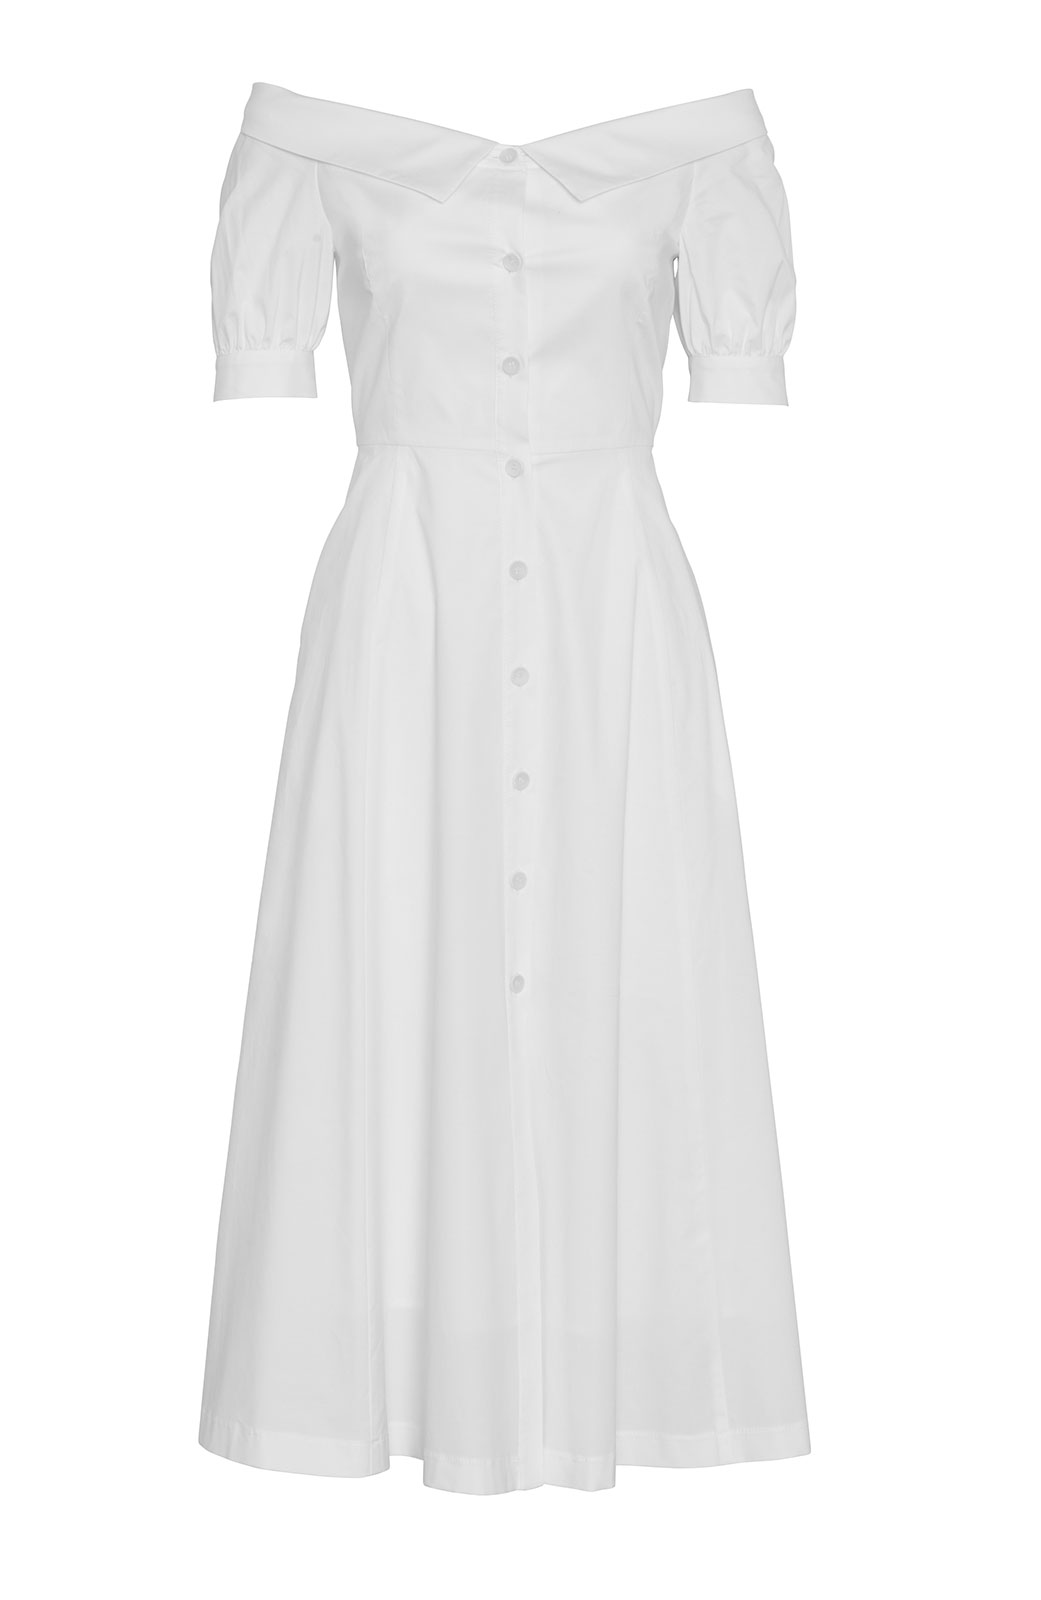 <ul><li>Short sleeve cotton off the shoulder shirt dress</li><li>Full skirt with button front detail</li><li>97% Cotton 3% Elastane, Lining - 100% Cotton</li><li>Dry Clean Only</li></ul>